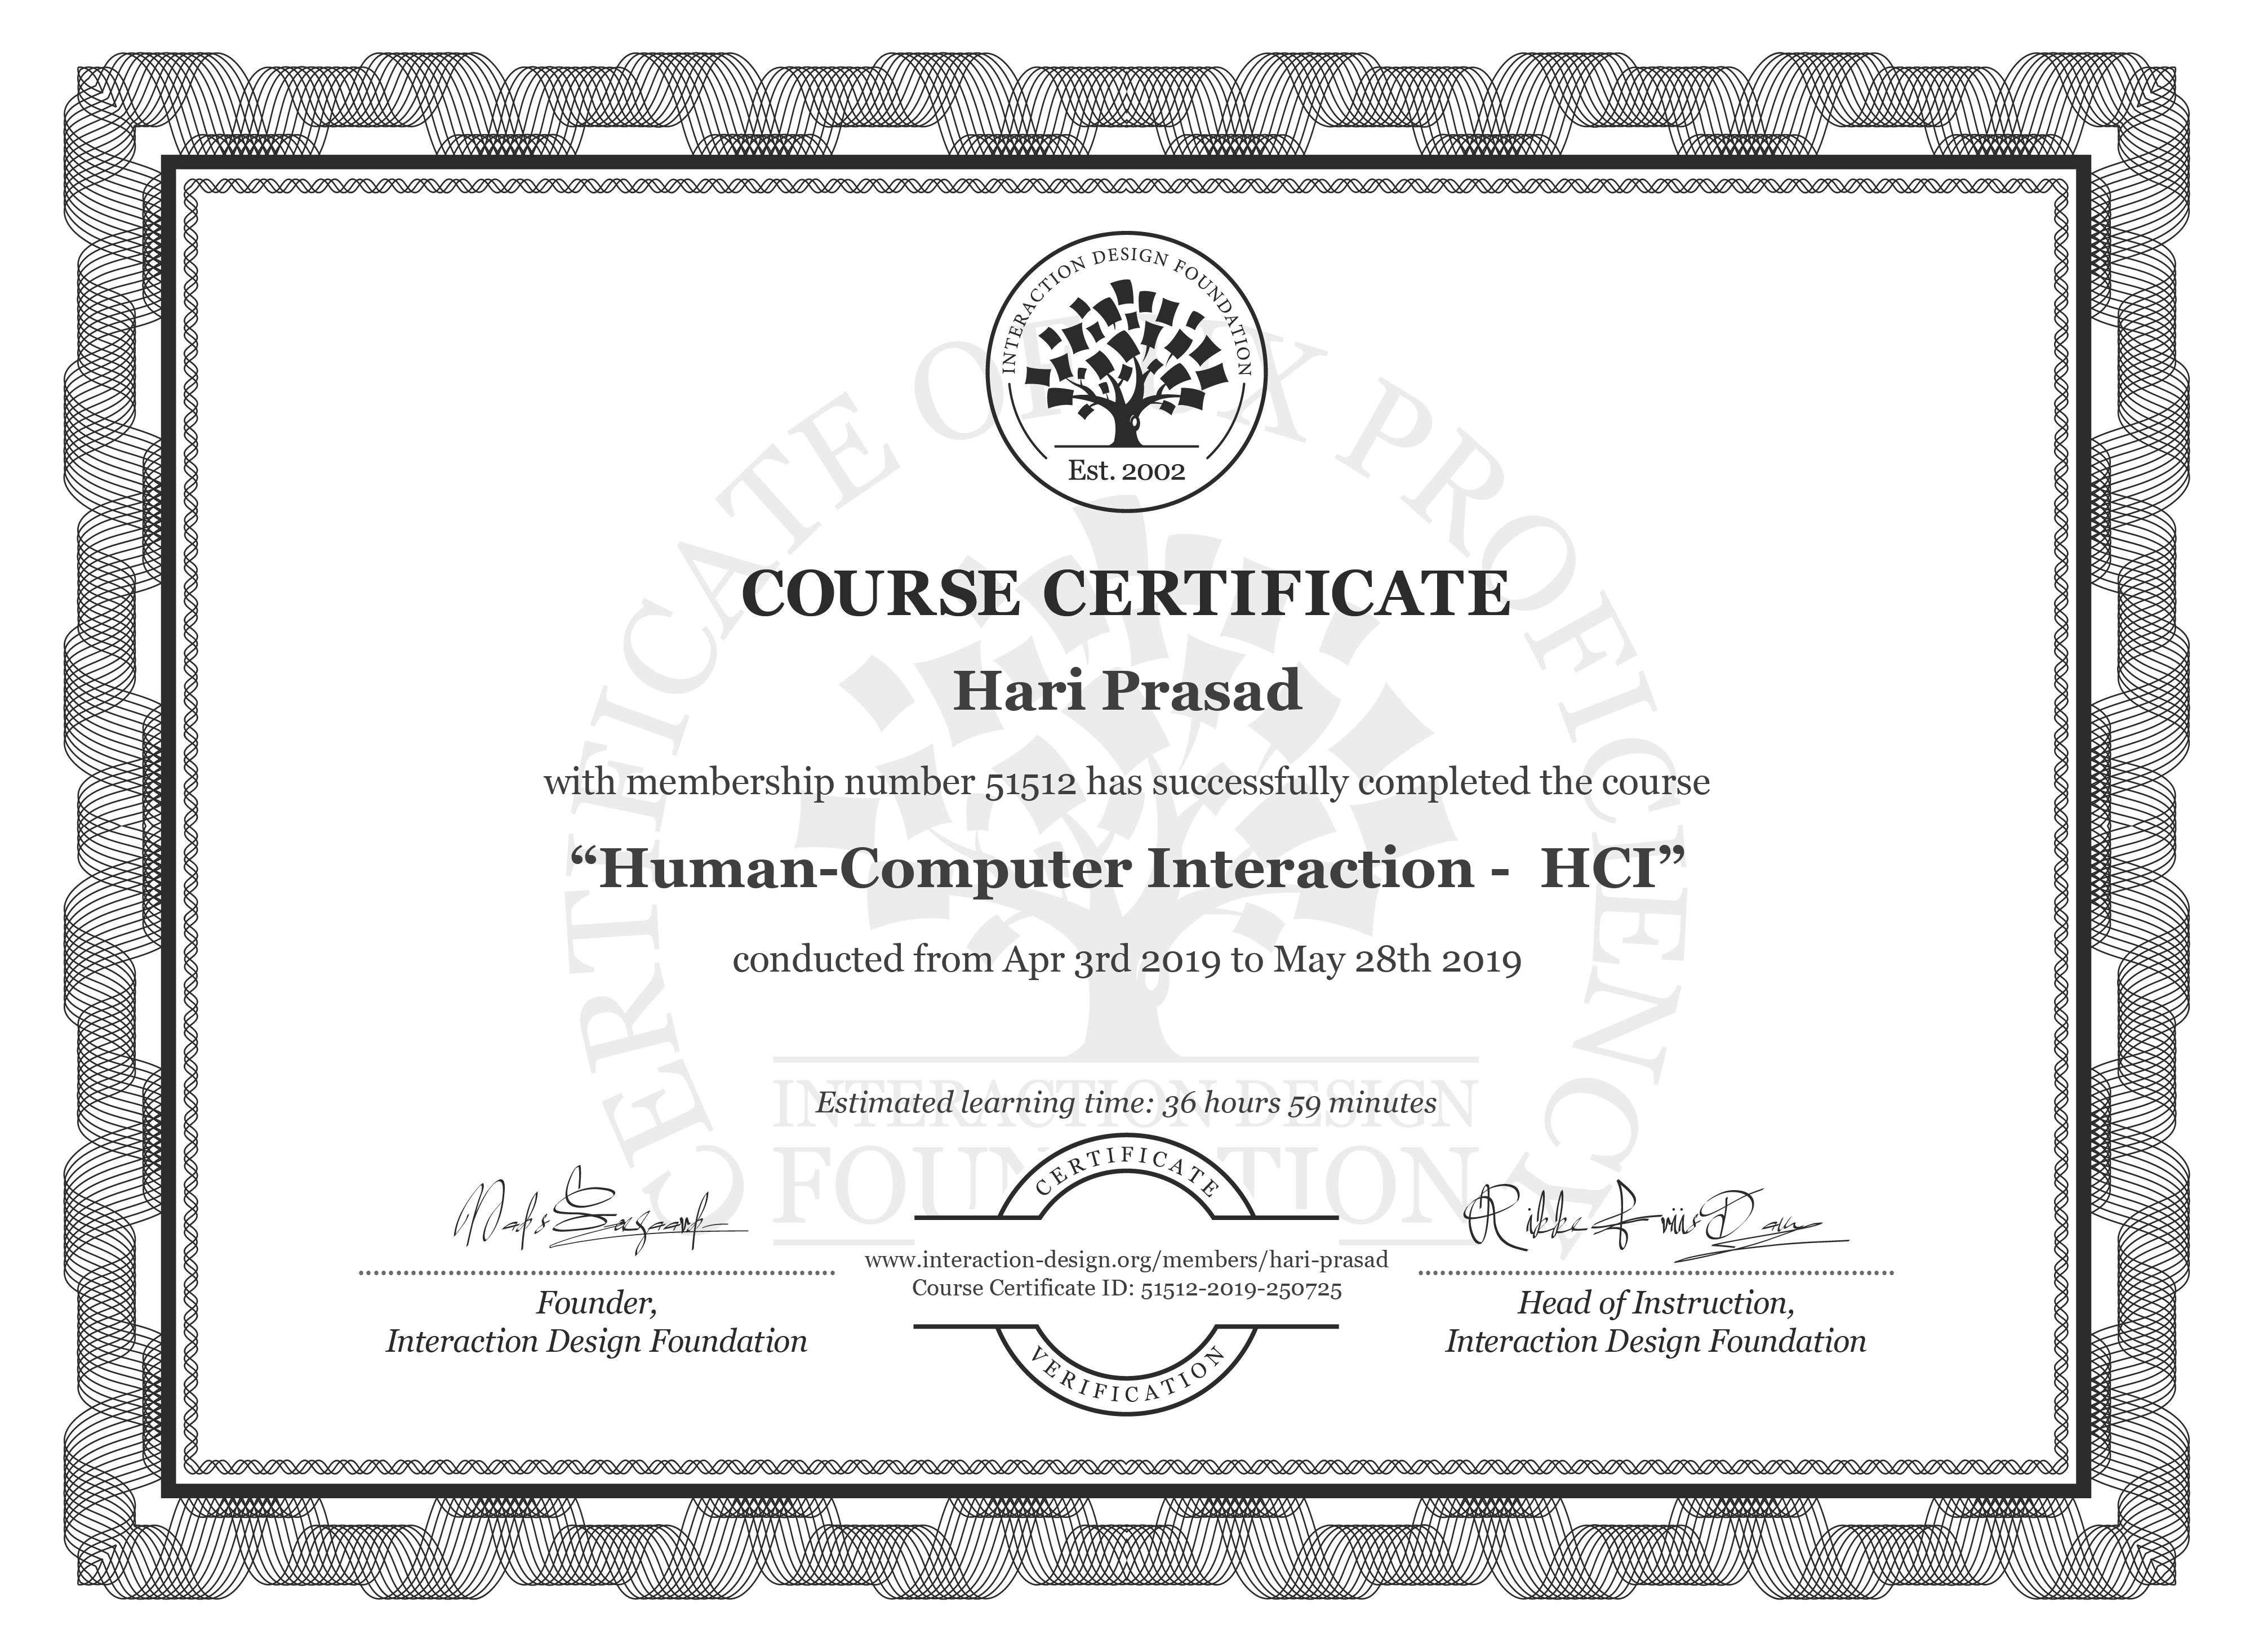 Hari Prasad's Course Certificate: Human-Computer Interaction -  HCI